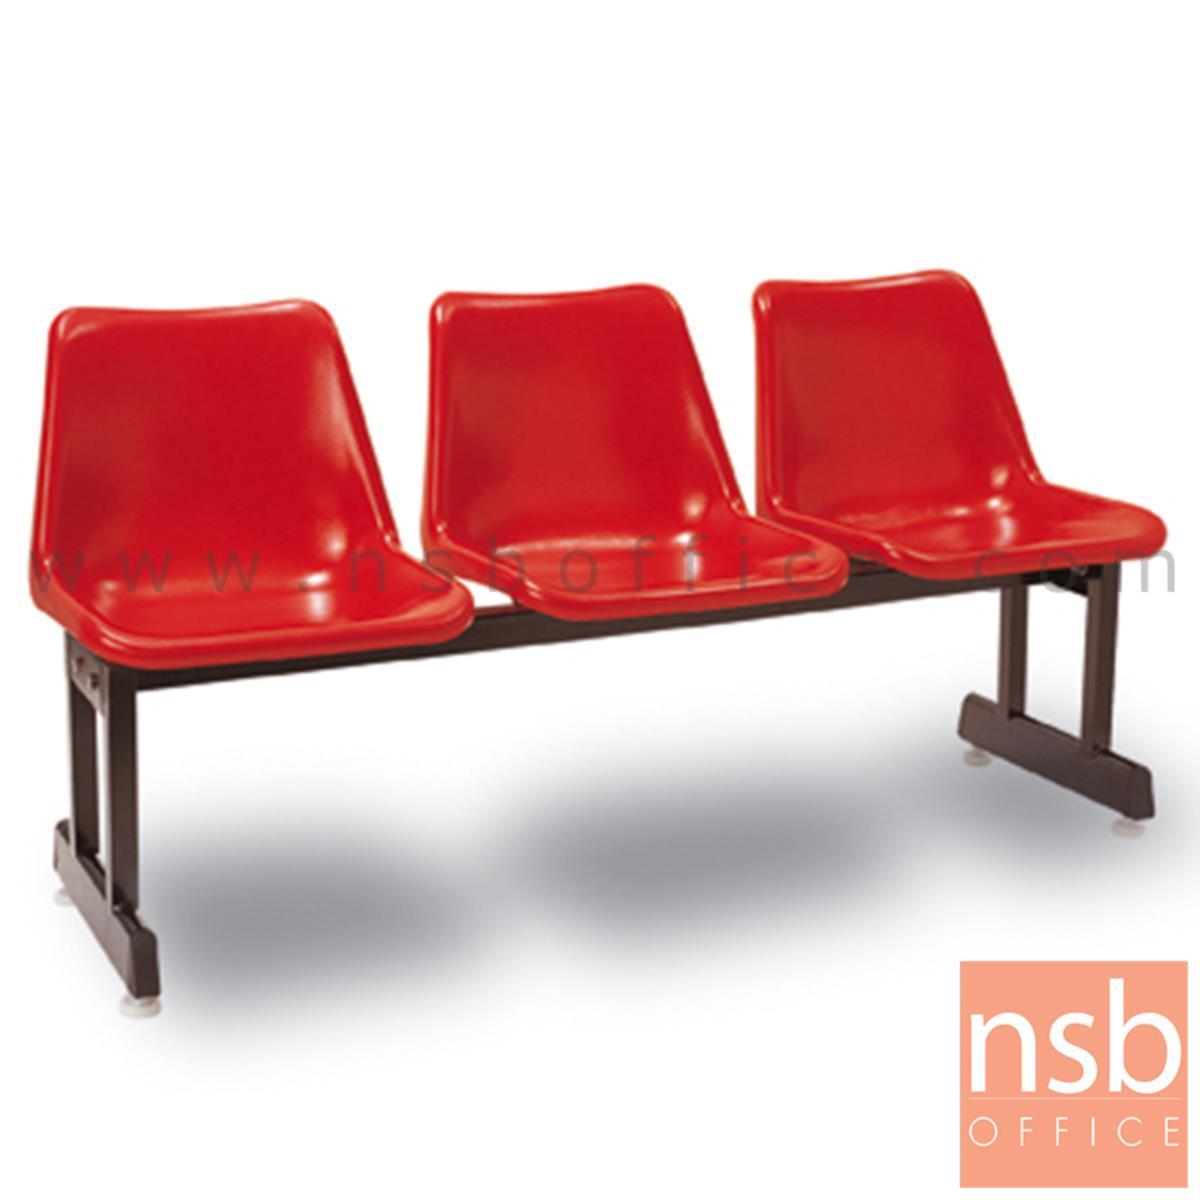 B06A062:เก้าอี้นั่งคอยเฟรมโพลี่ รุ่น LB-11 2 ,3 ,4 ที่นั่ง ขนาด 98W ,144W 194W cm. ขาเหล็ก